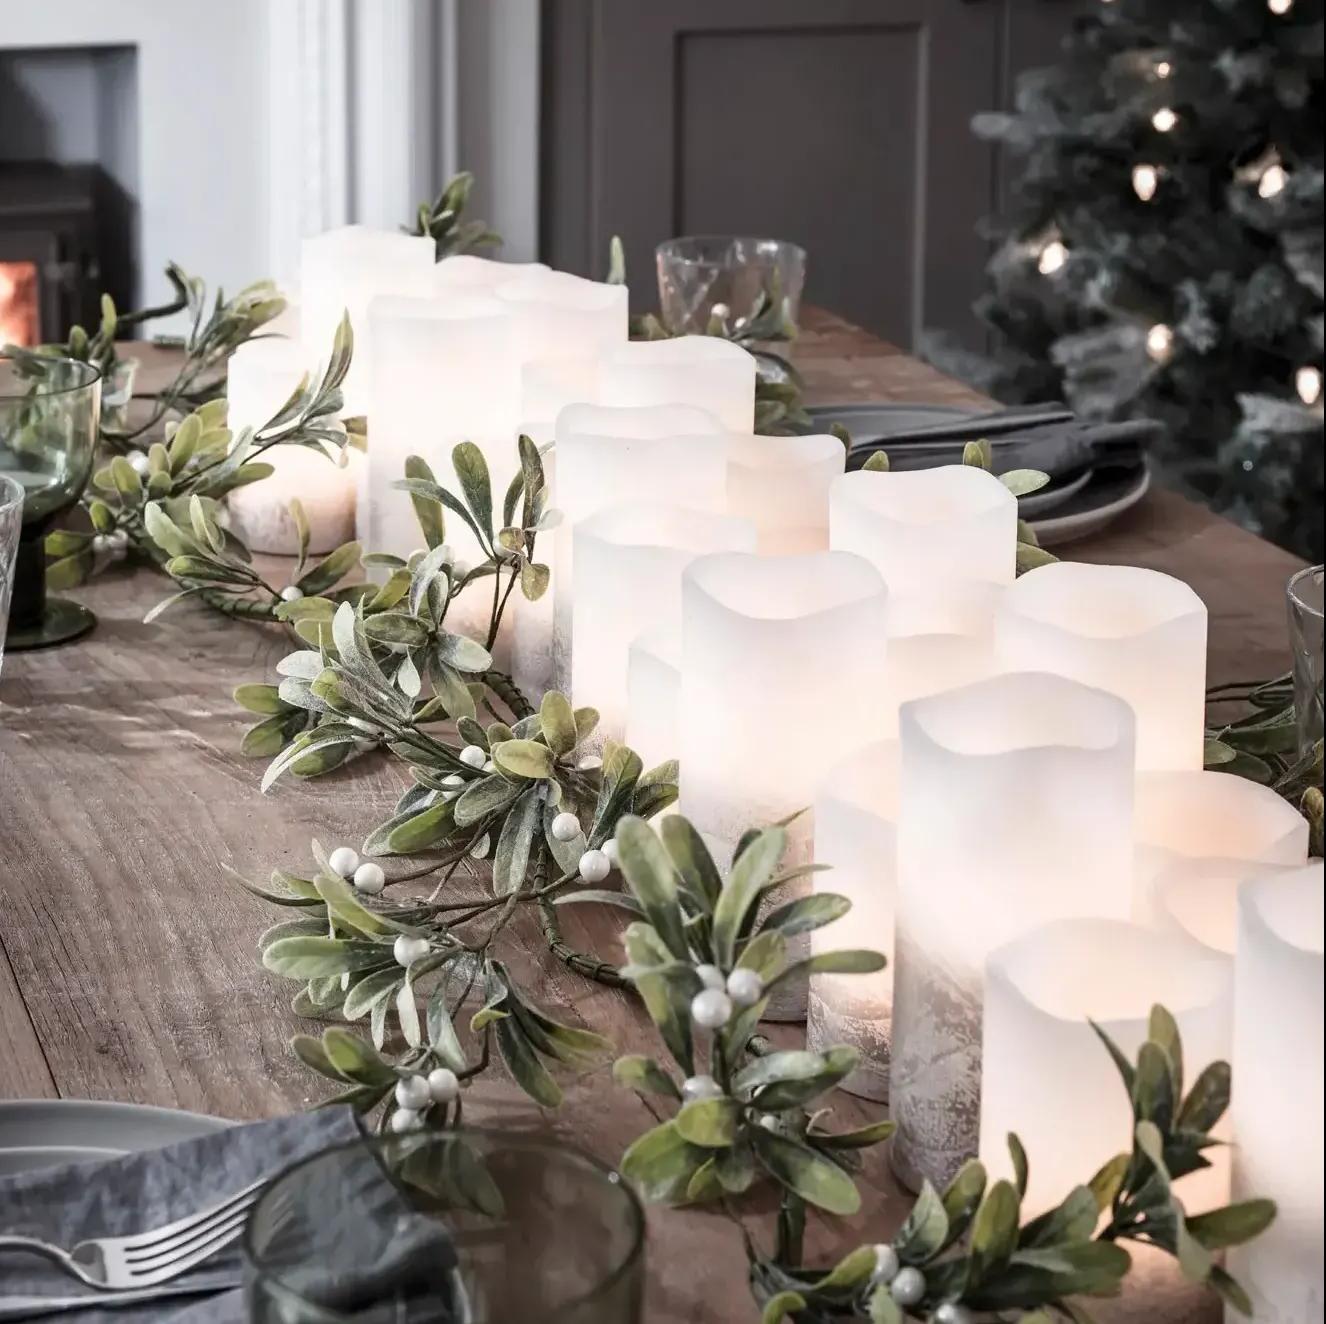 Bougies de Noel sur Table